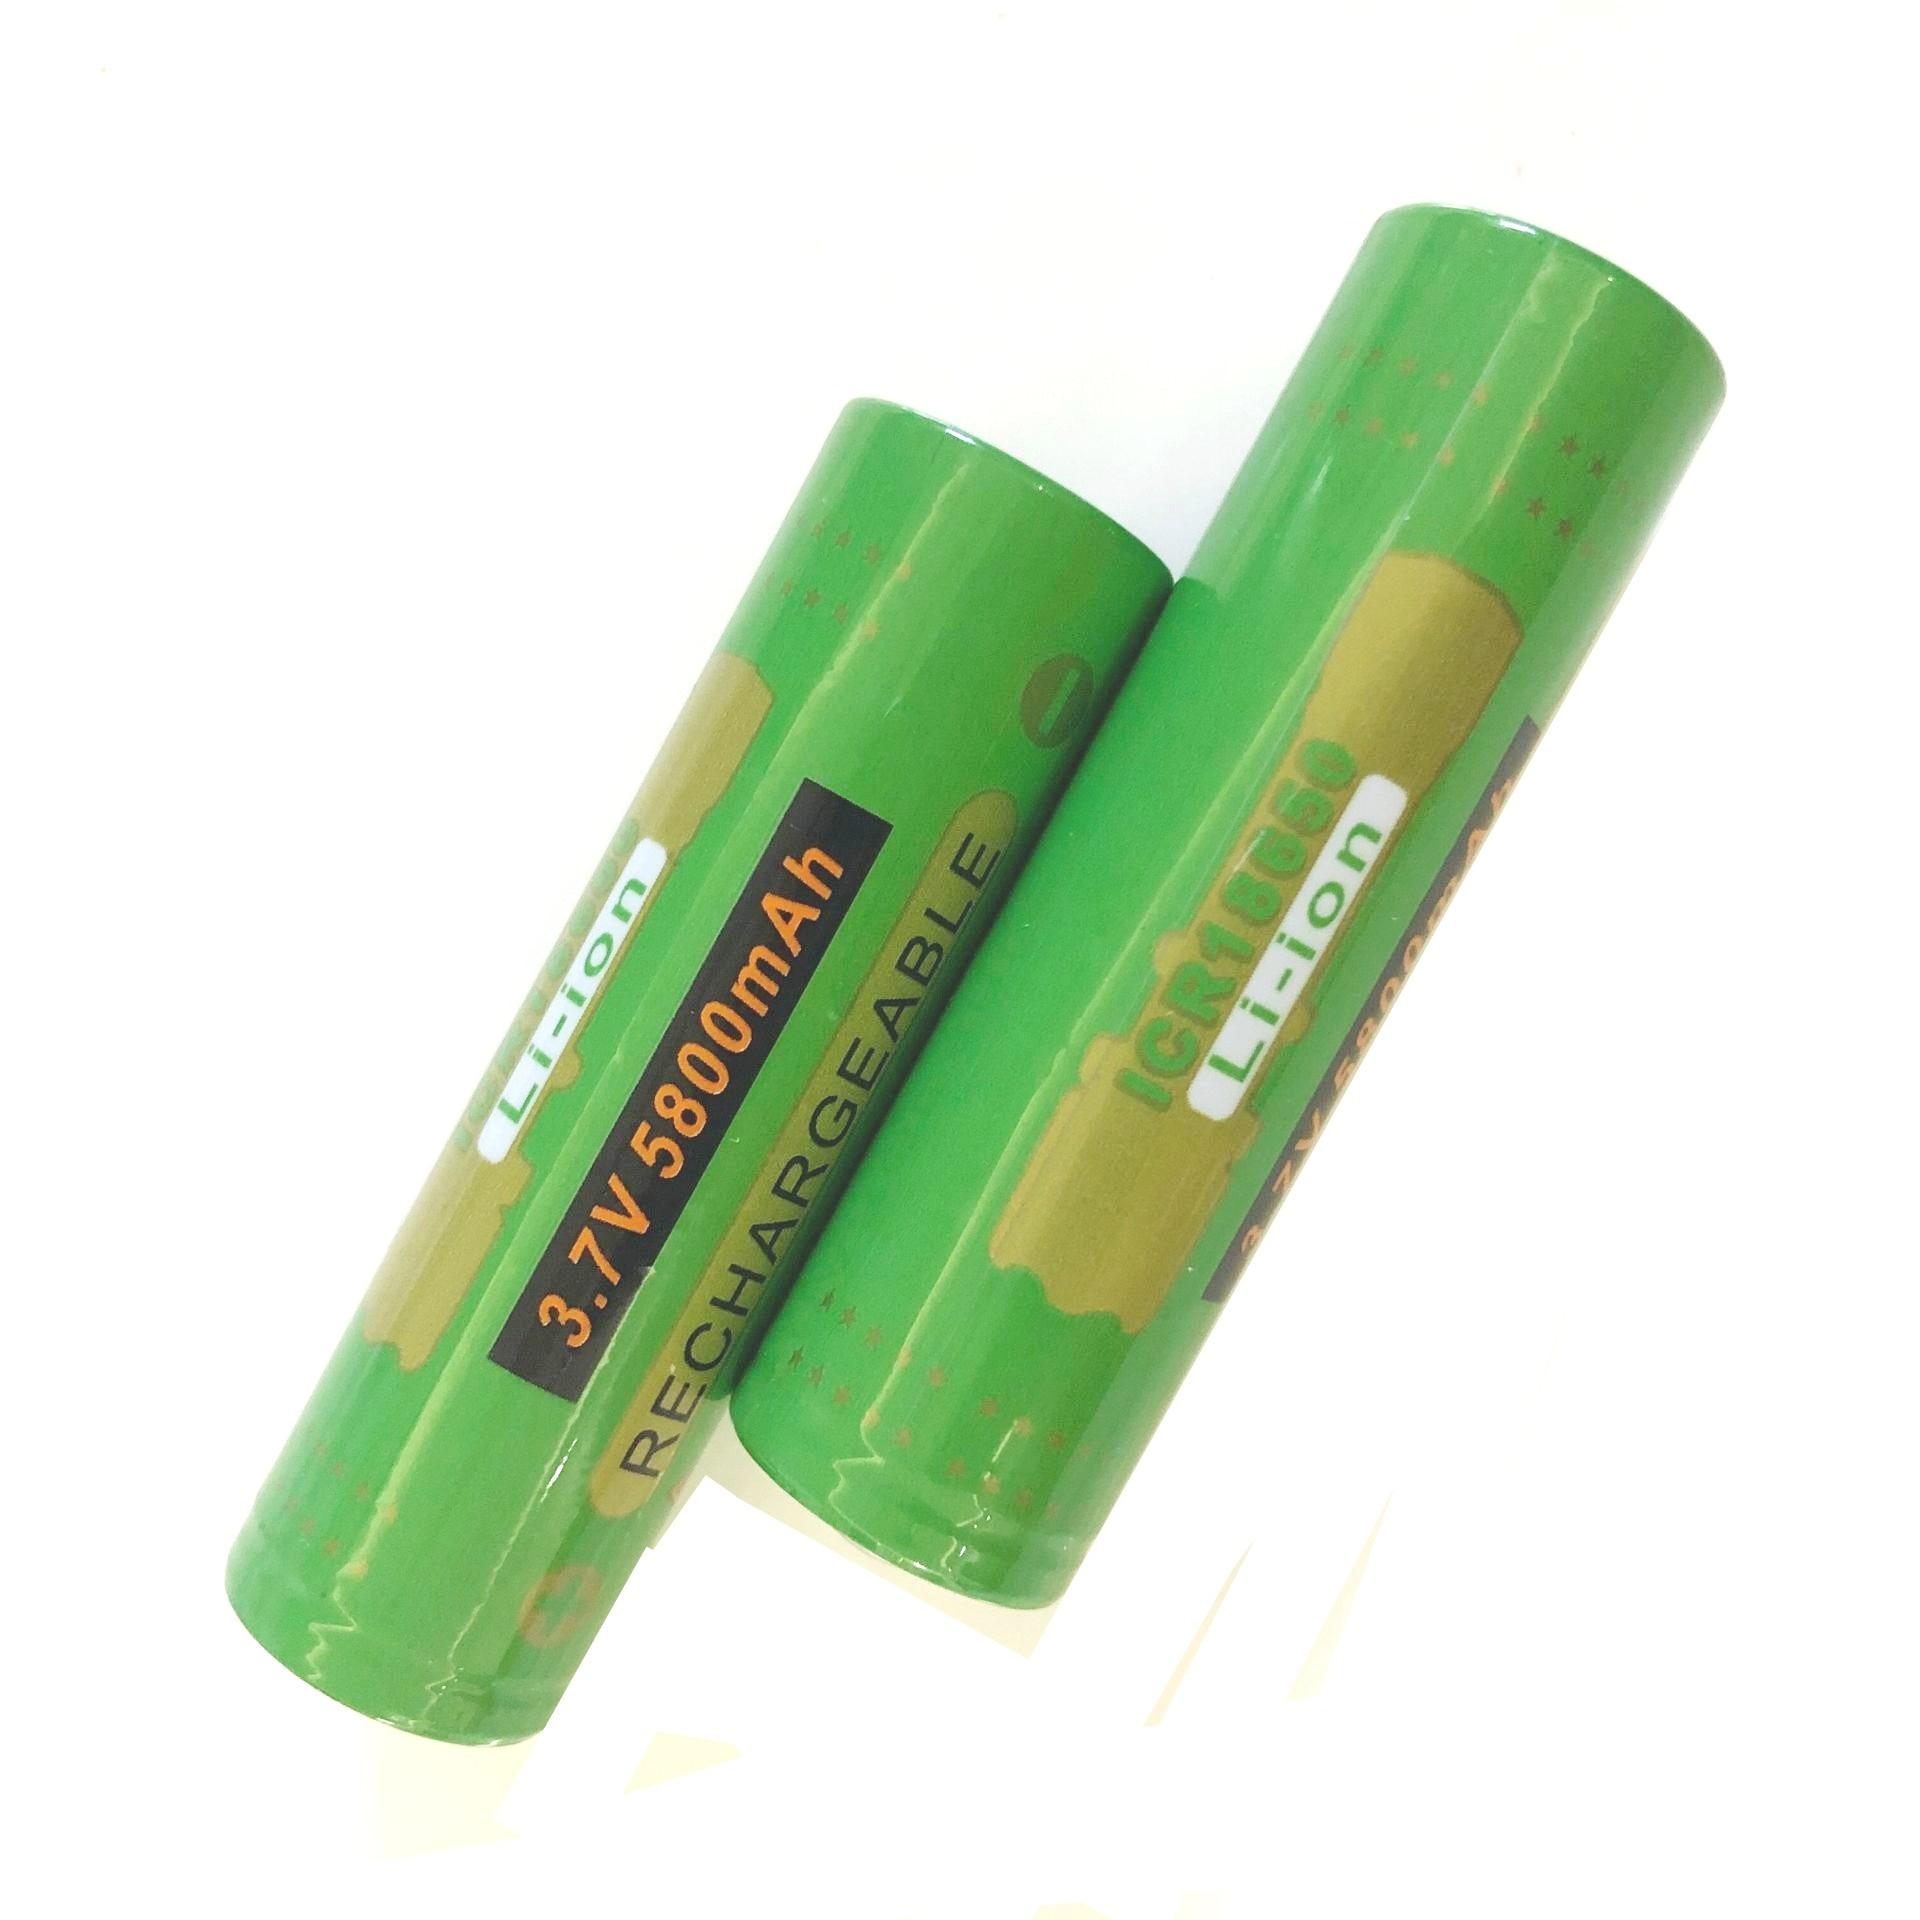 ICR18650 3.7V 5800Mah Li-ion batterie Rechargeable pour lampe de poche phare phare laser batterie